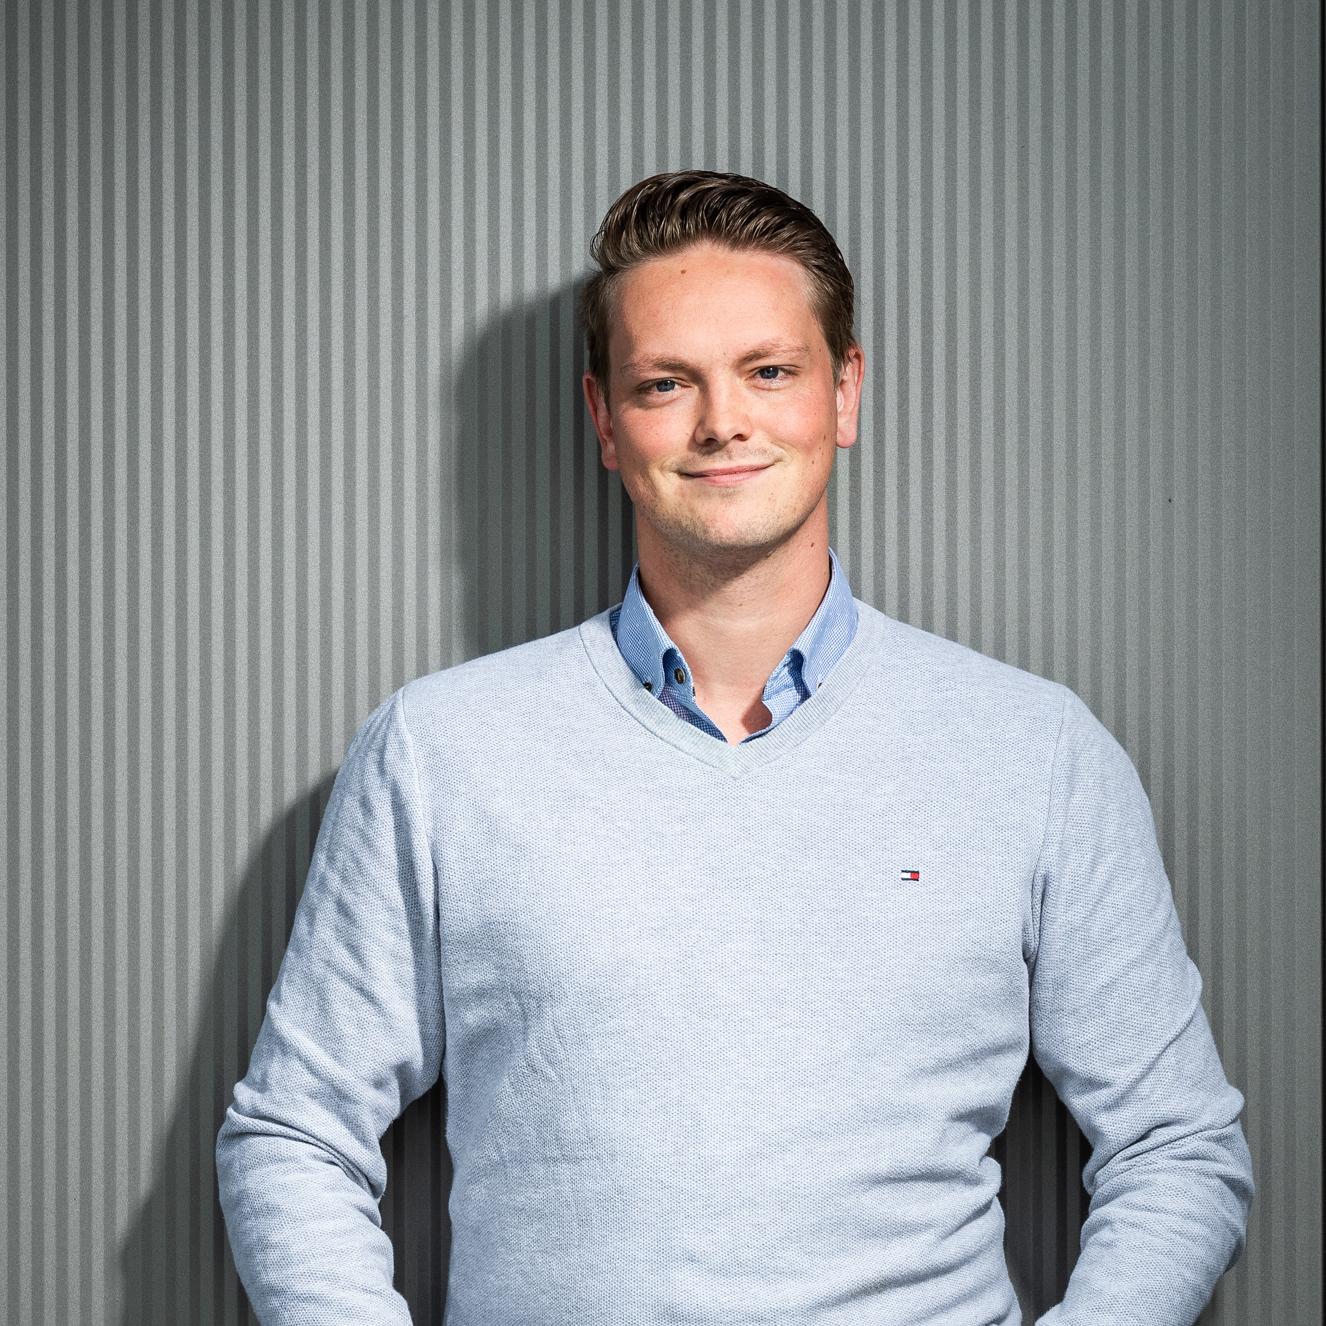 Christoph Aulenbrock